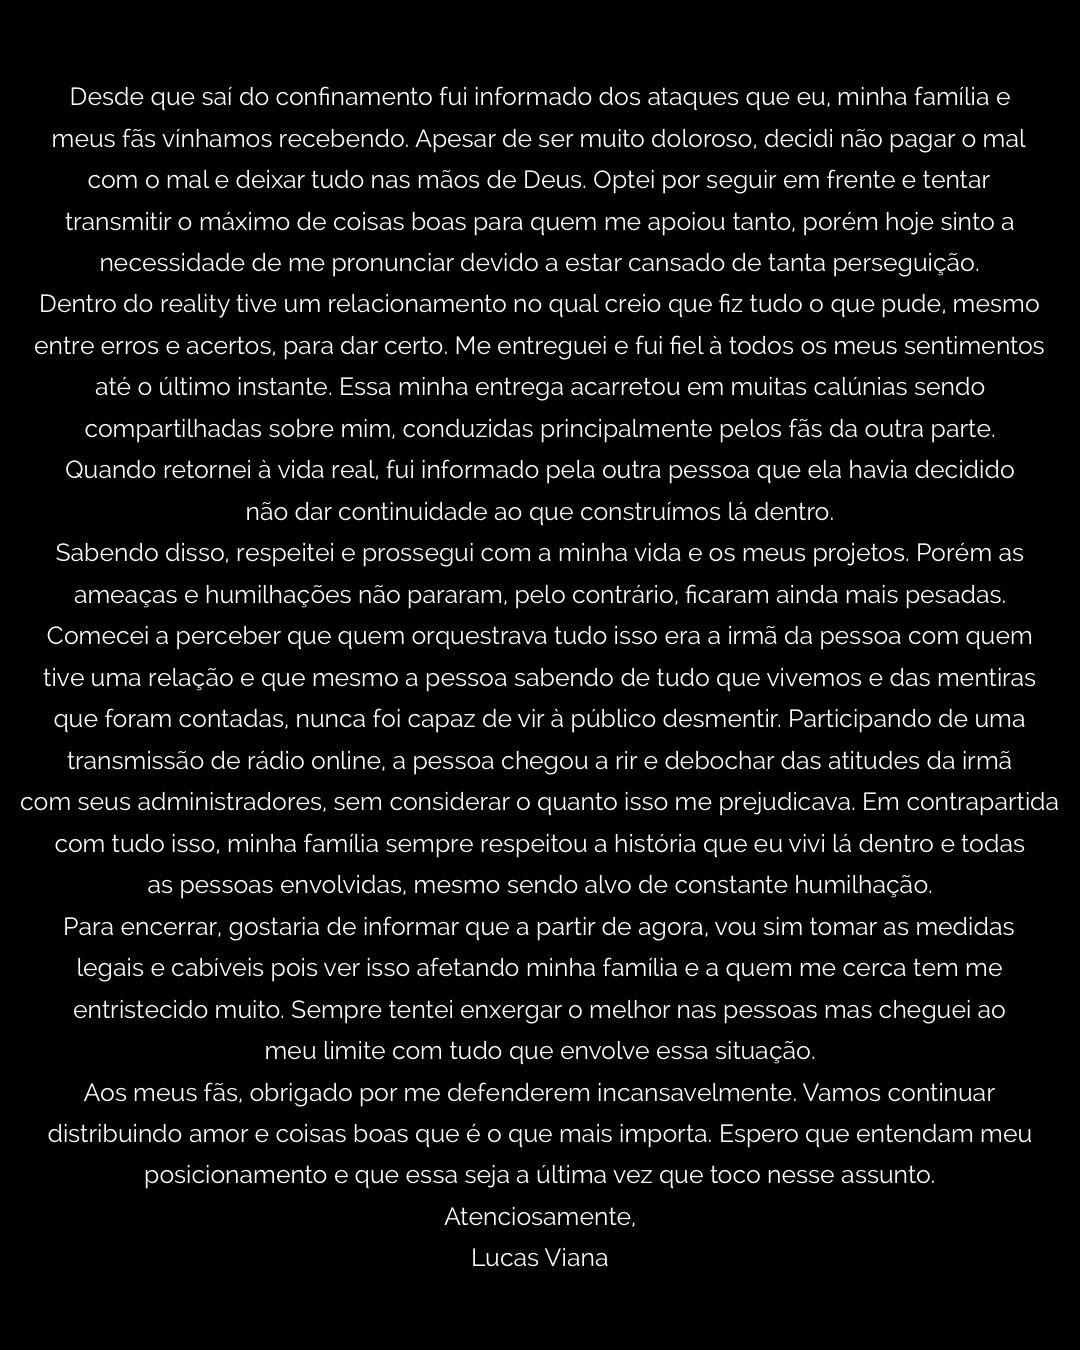 Carta de Lucas Viana